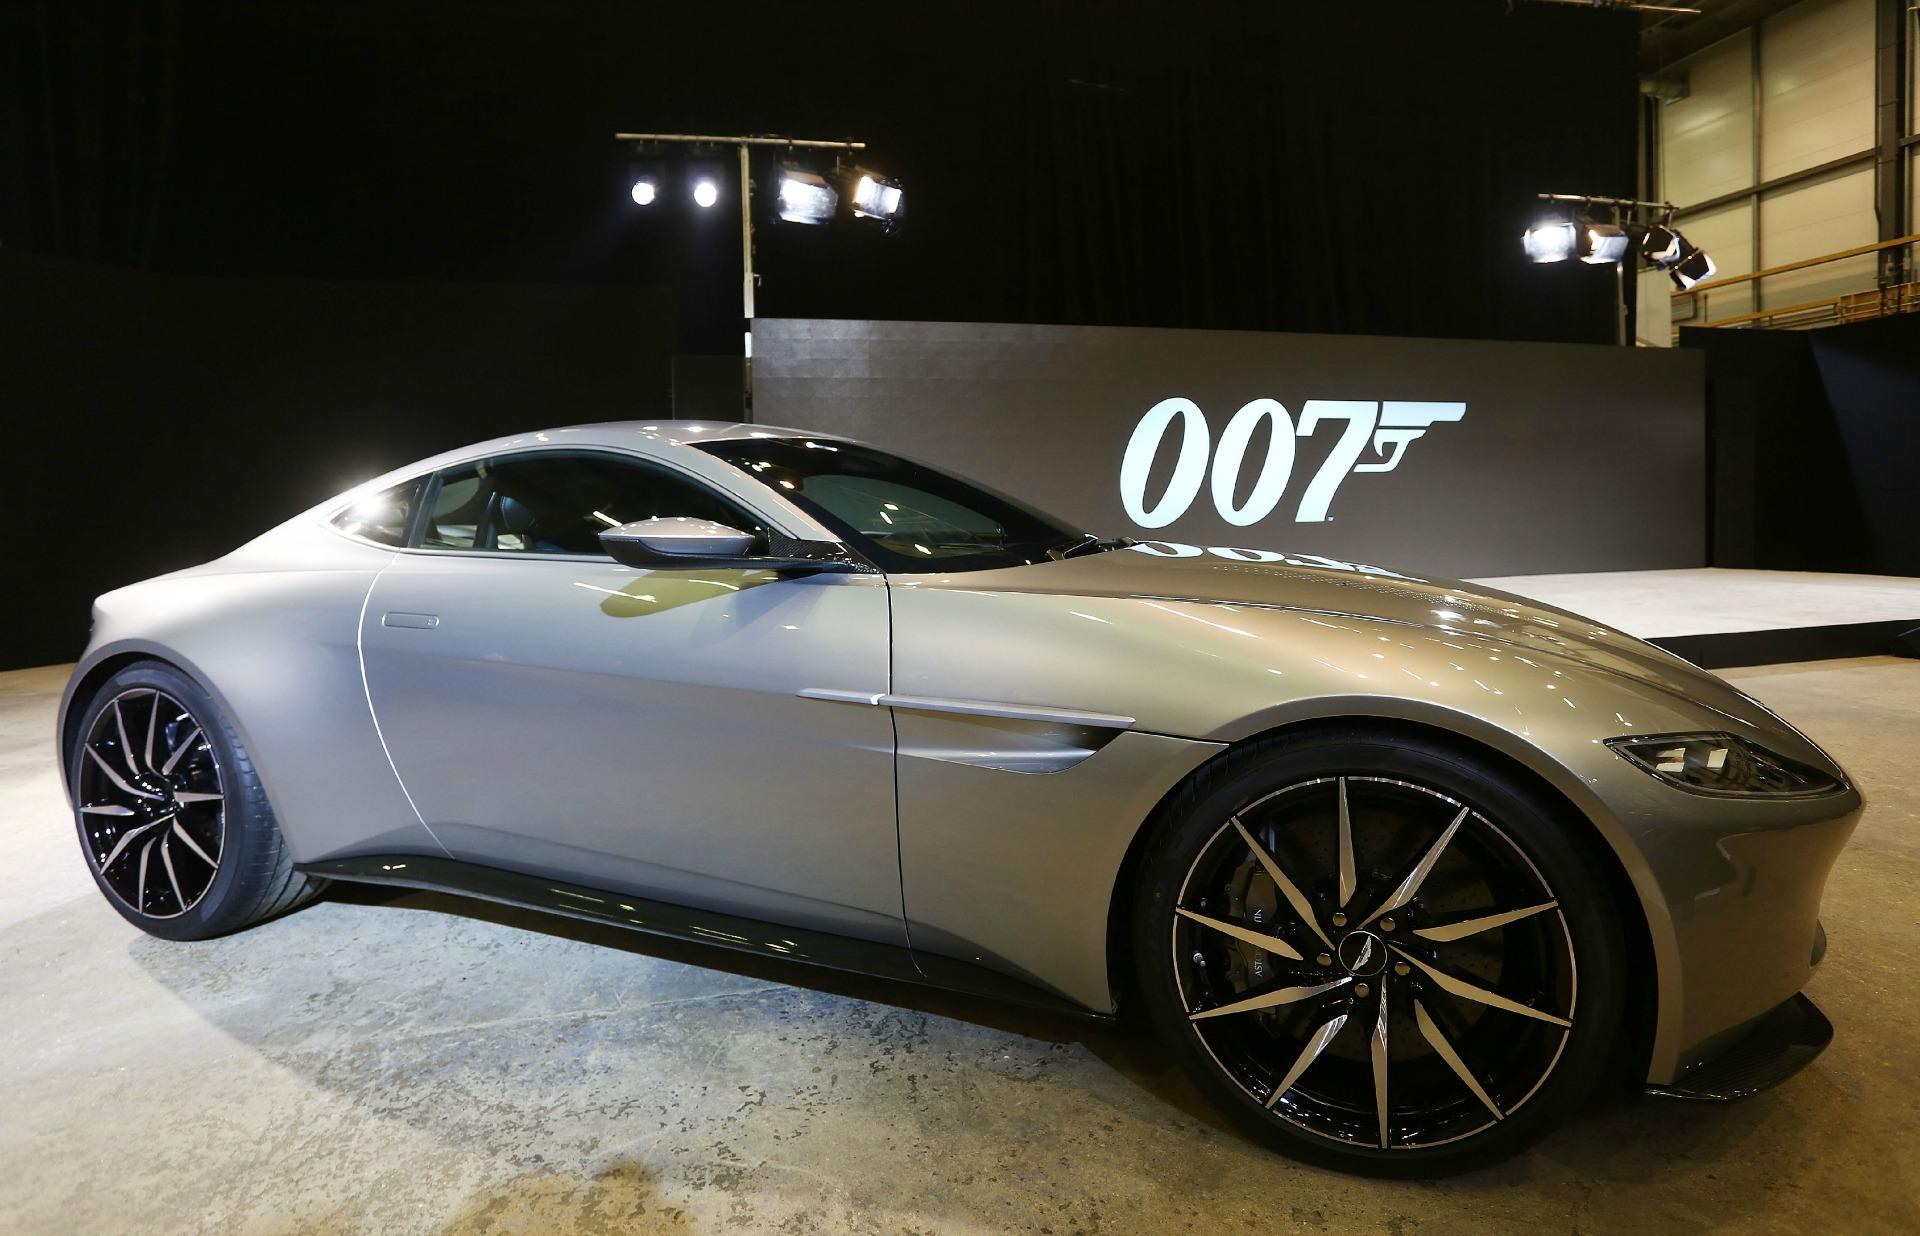 Looking for the best 007 skyfall wallpaper? Aston Martin Db10 Wallpaper Design Corral